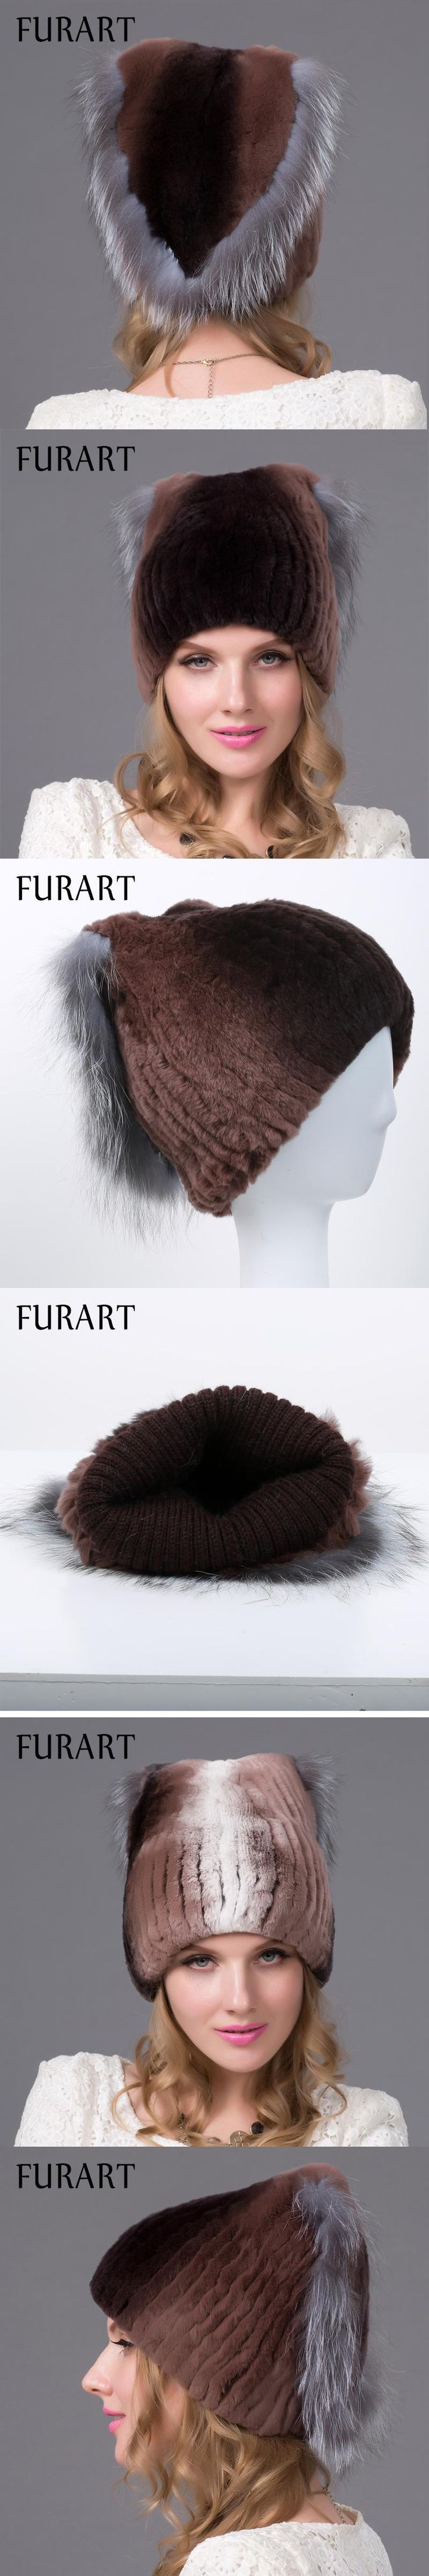 Winter fur hats for women rex rabbit fur hat silver fox fur with lining pom pom knit beanies  With lining Russian fur cap